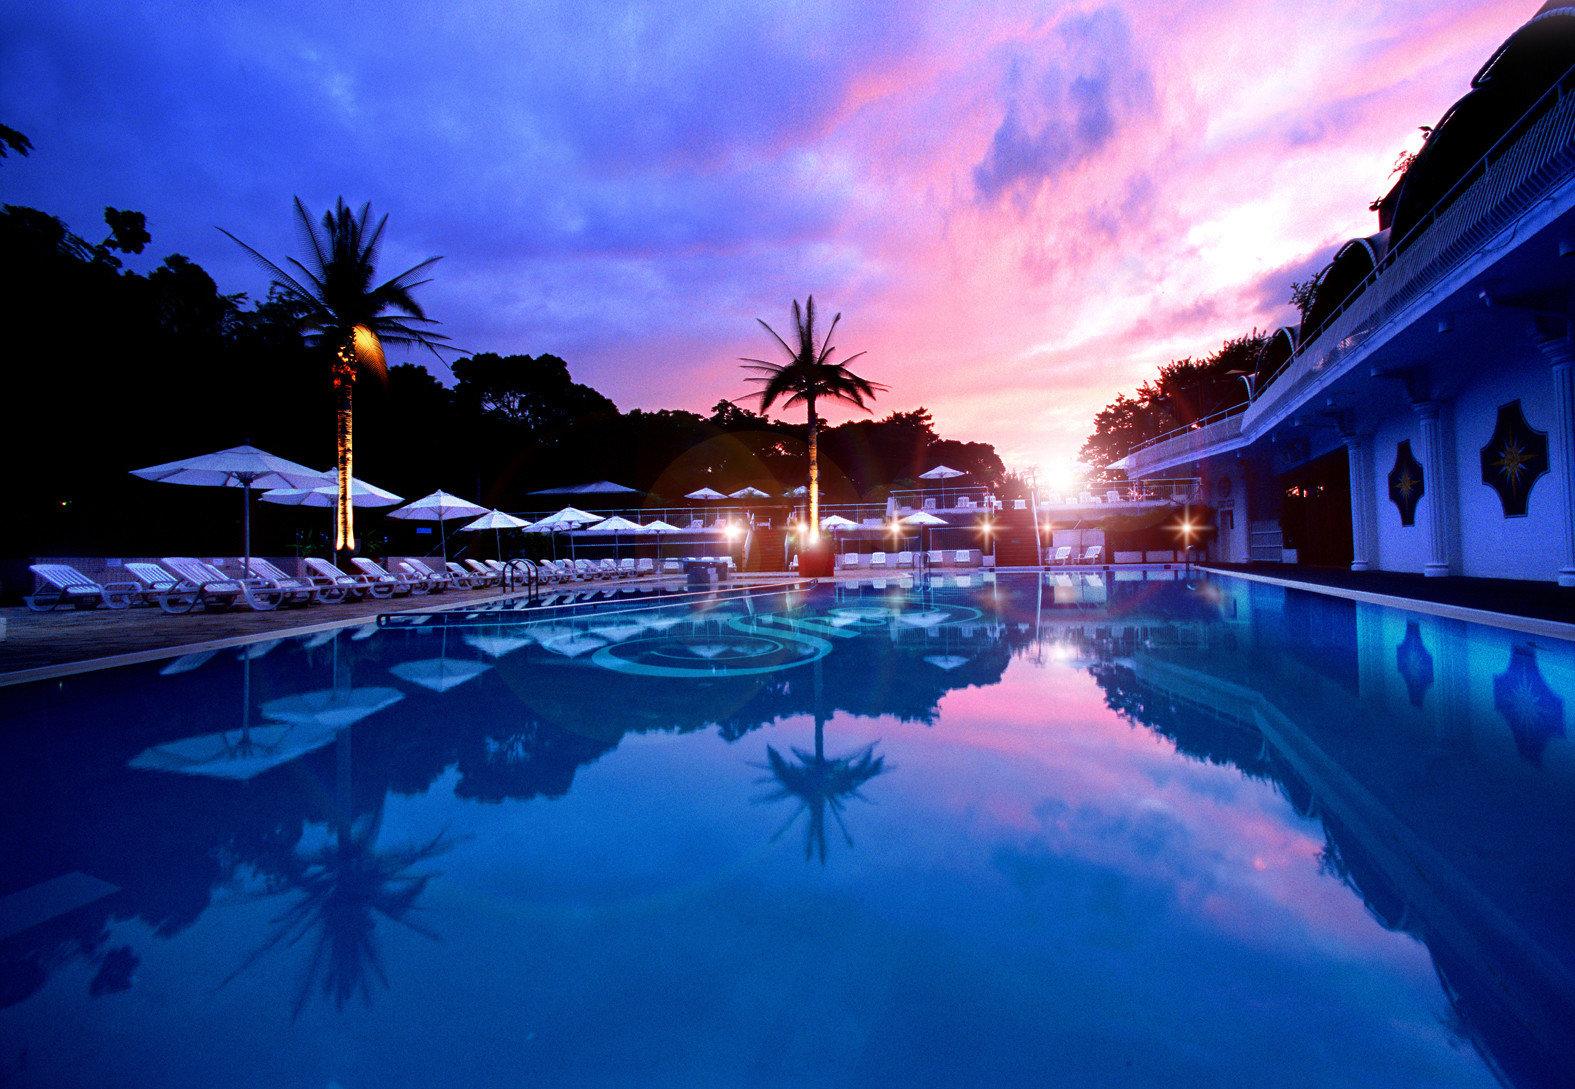 City Nightlife Resort Scenic views Sunset sky light night swimming pool evening dusk sunlight Sea clouds computer wallpaper